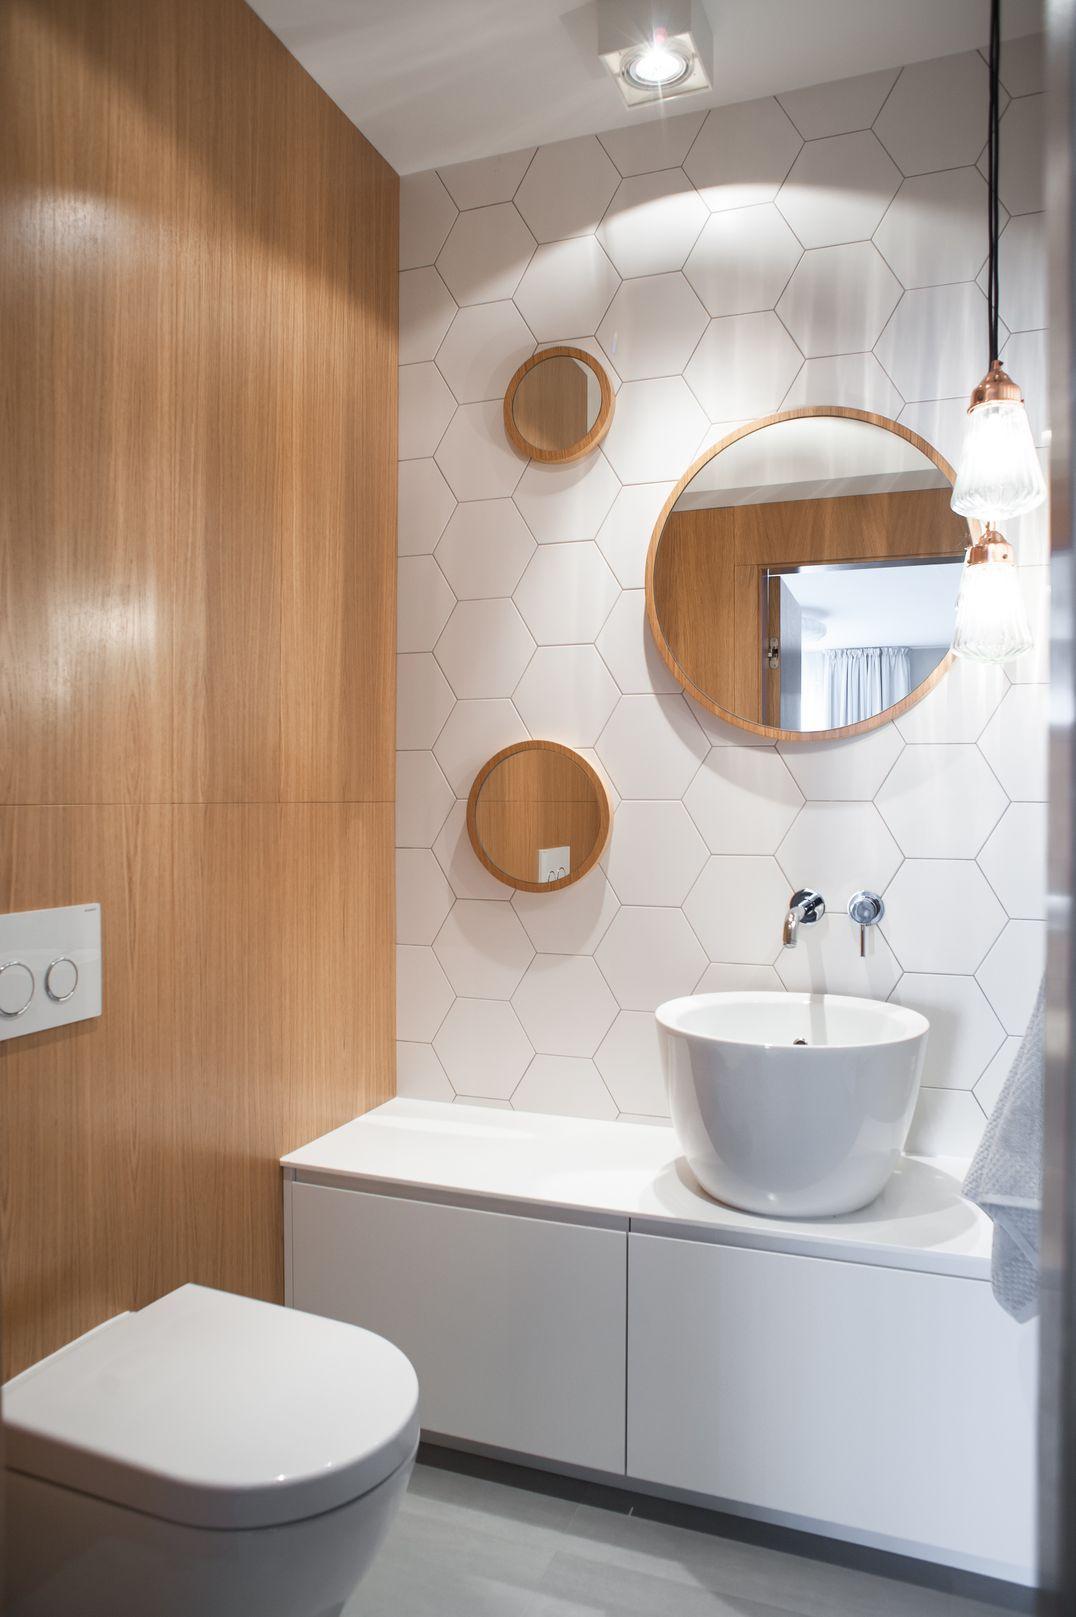 Naturalne D Bowe Drewno W Ca Ym Mieszkaniu Pinterest Toilette